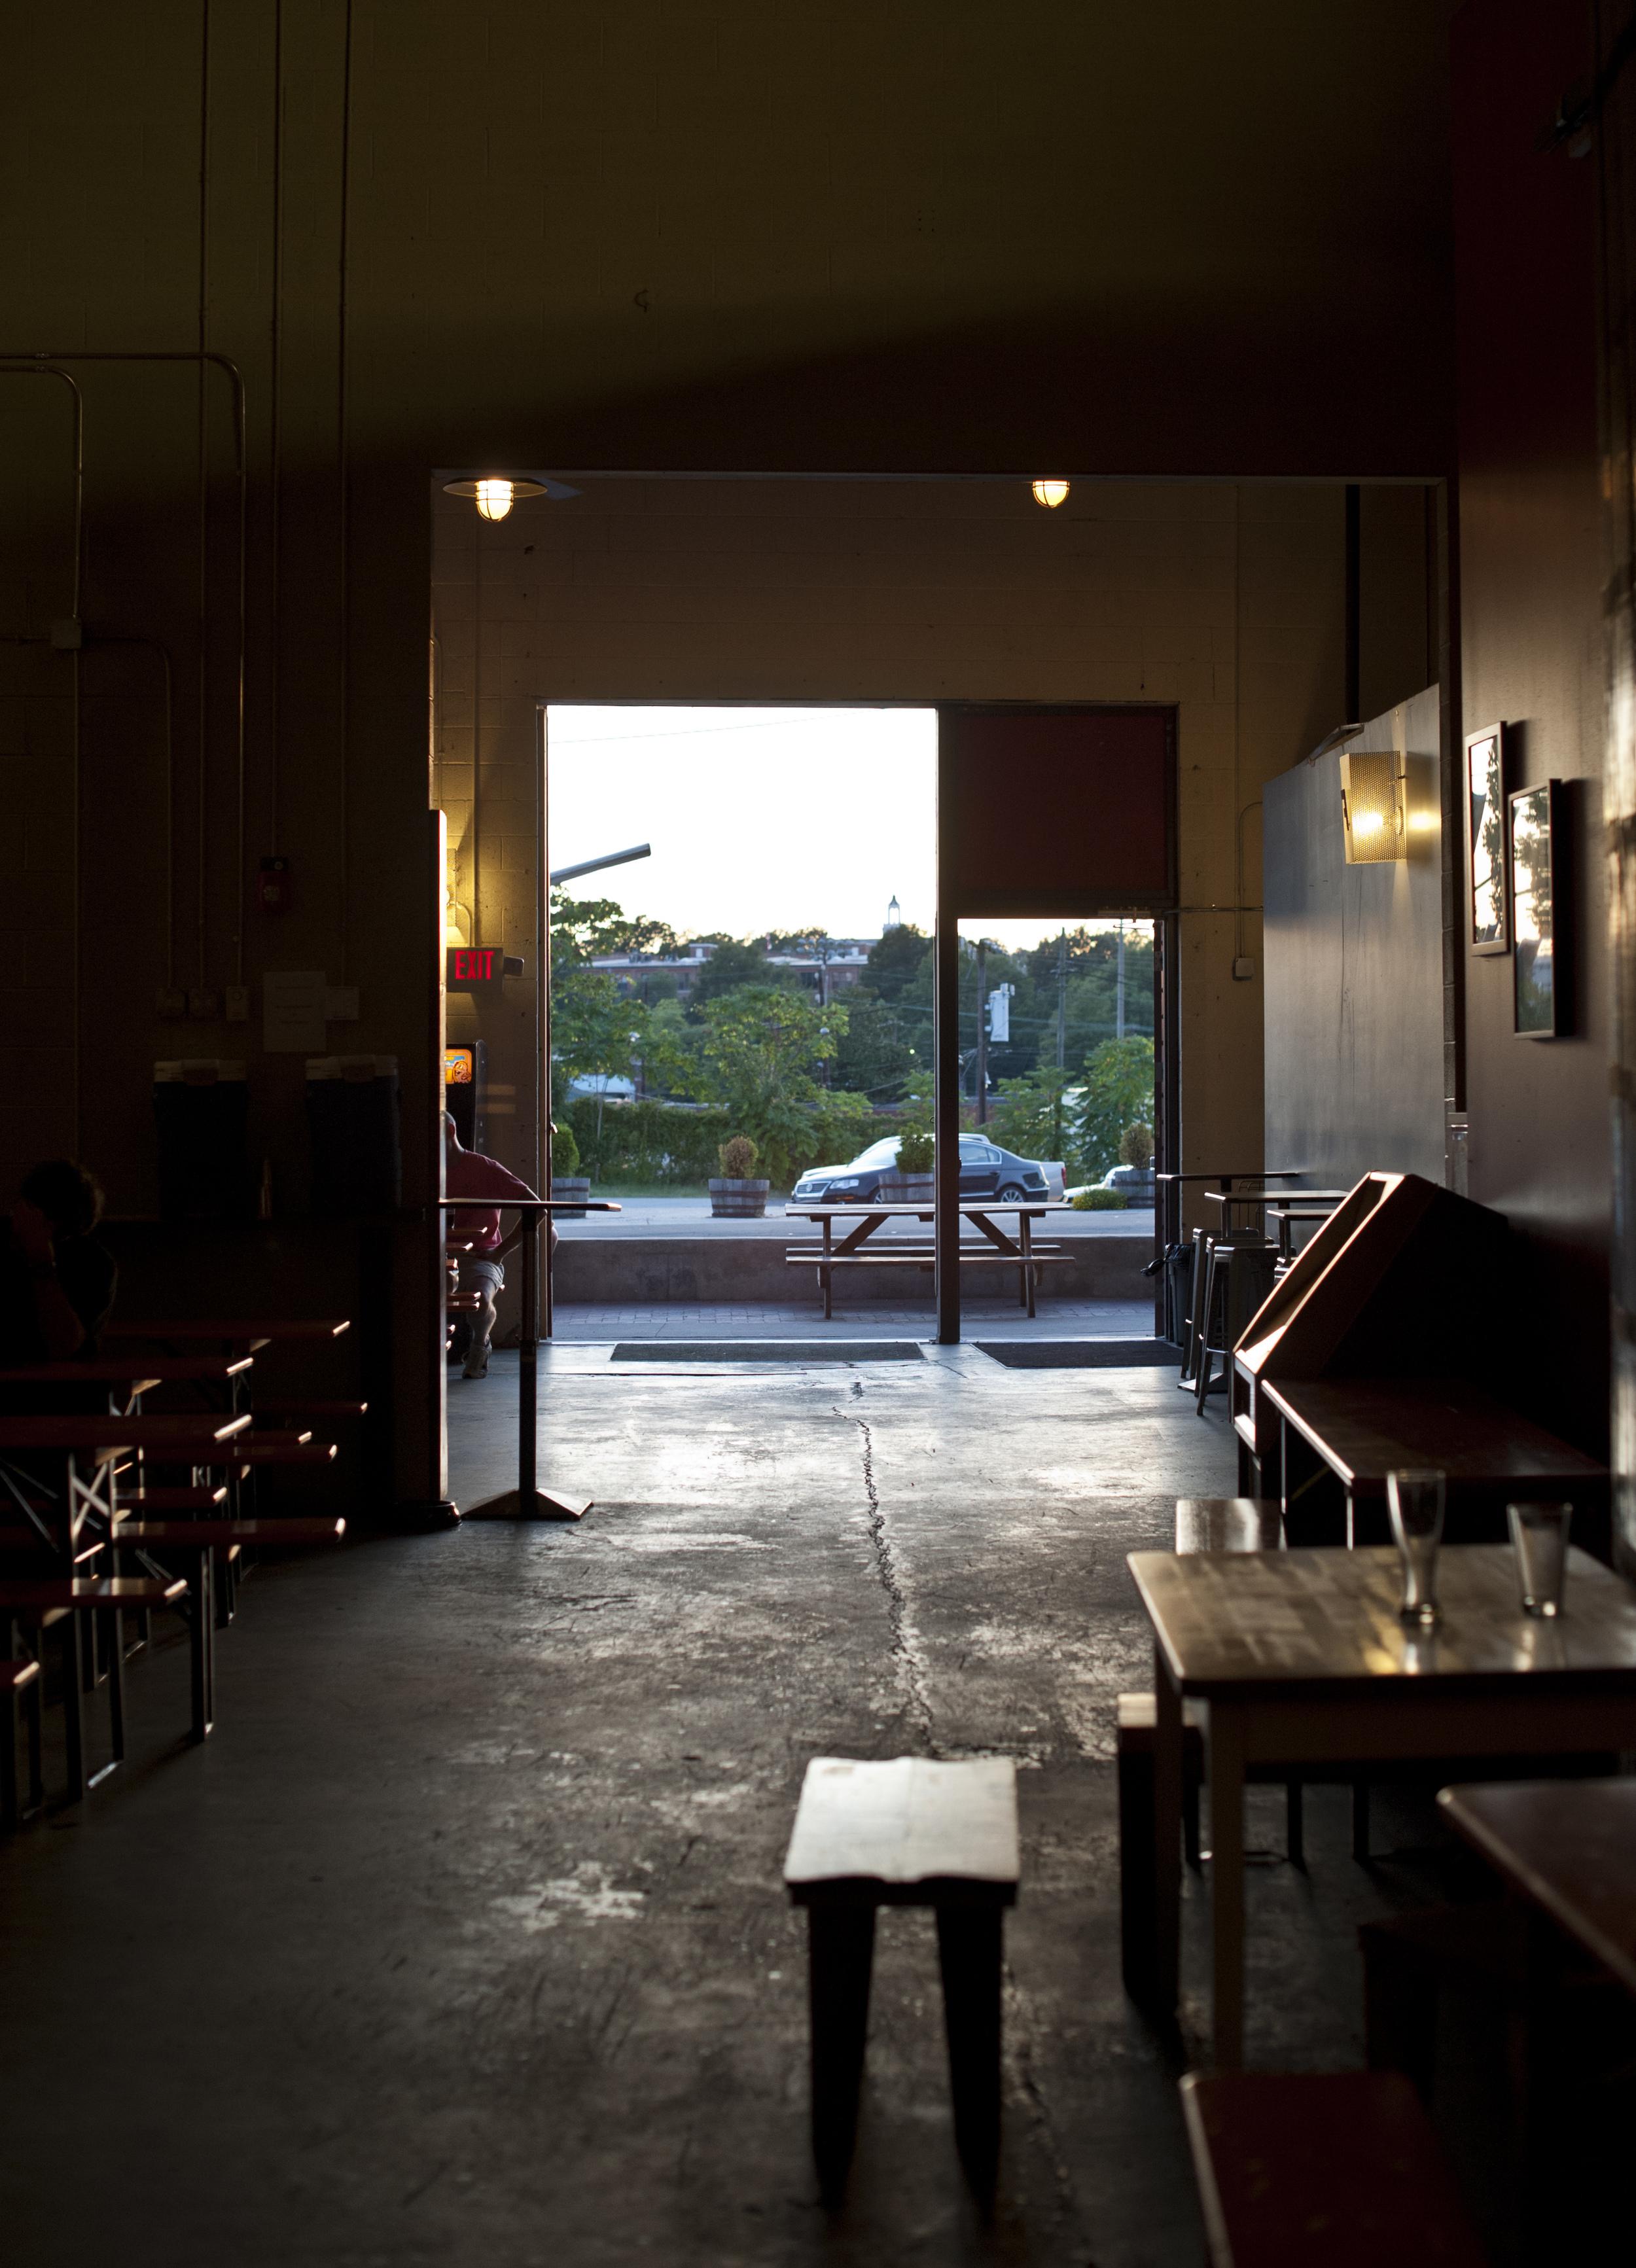 Durham_LazySunday_DoorwayatFullsteam_8252013.jpg